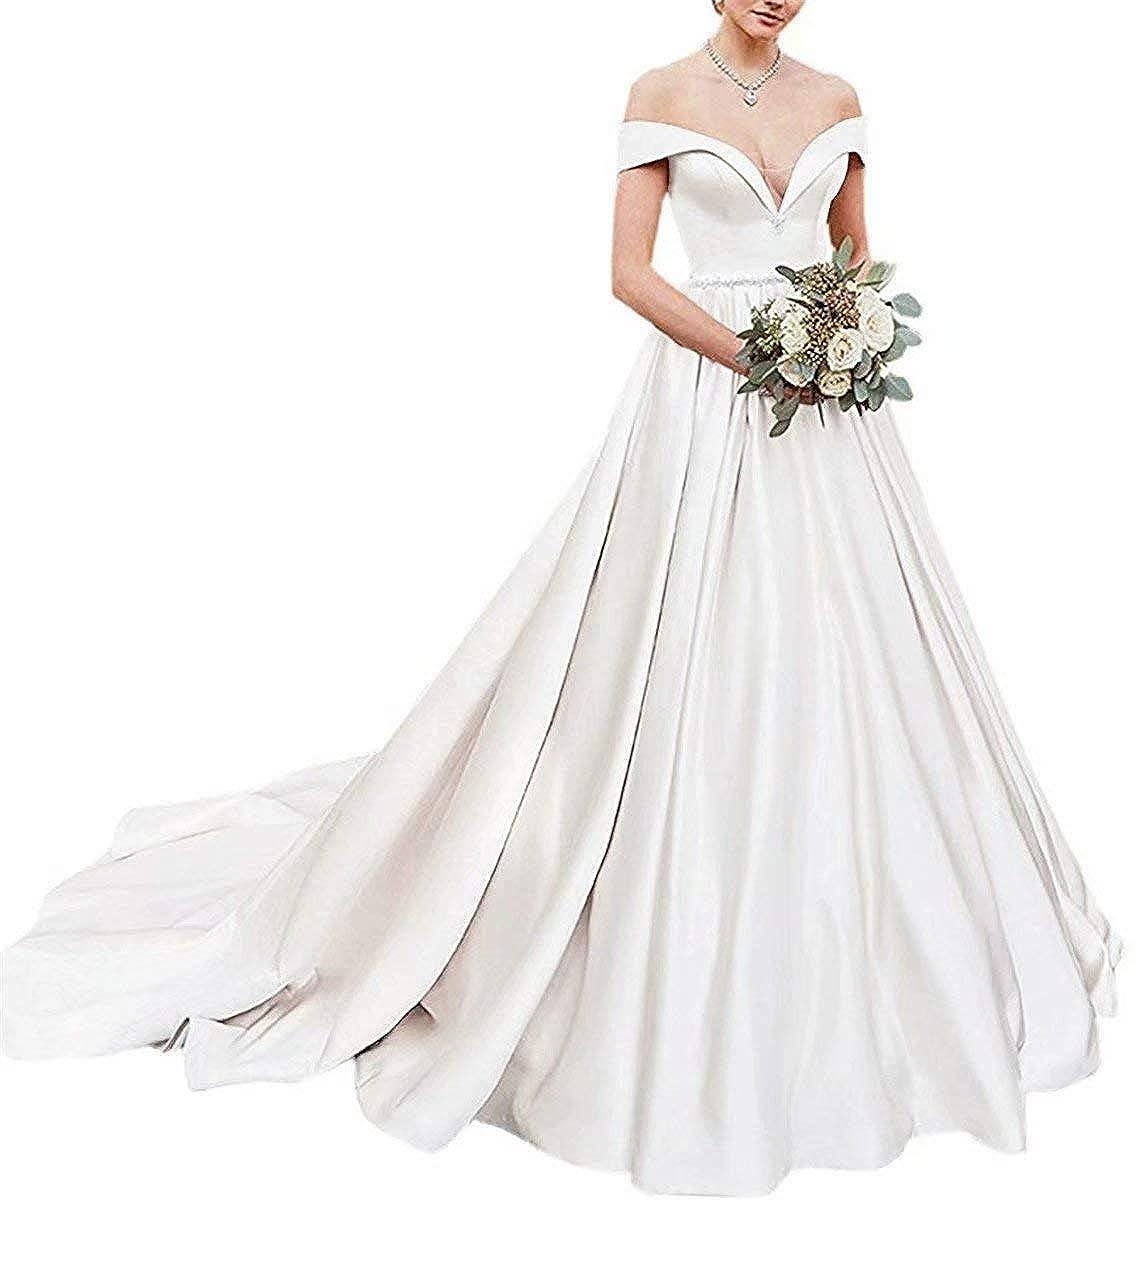 4e59e1314333f HellodayZ Women's Off Shoulder V Neck Satin Wedding Dress Bridal Gowns Long  at Amazon Women's Clothing store: